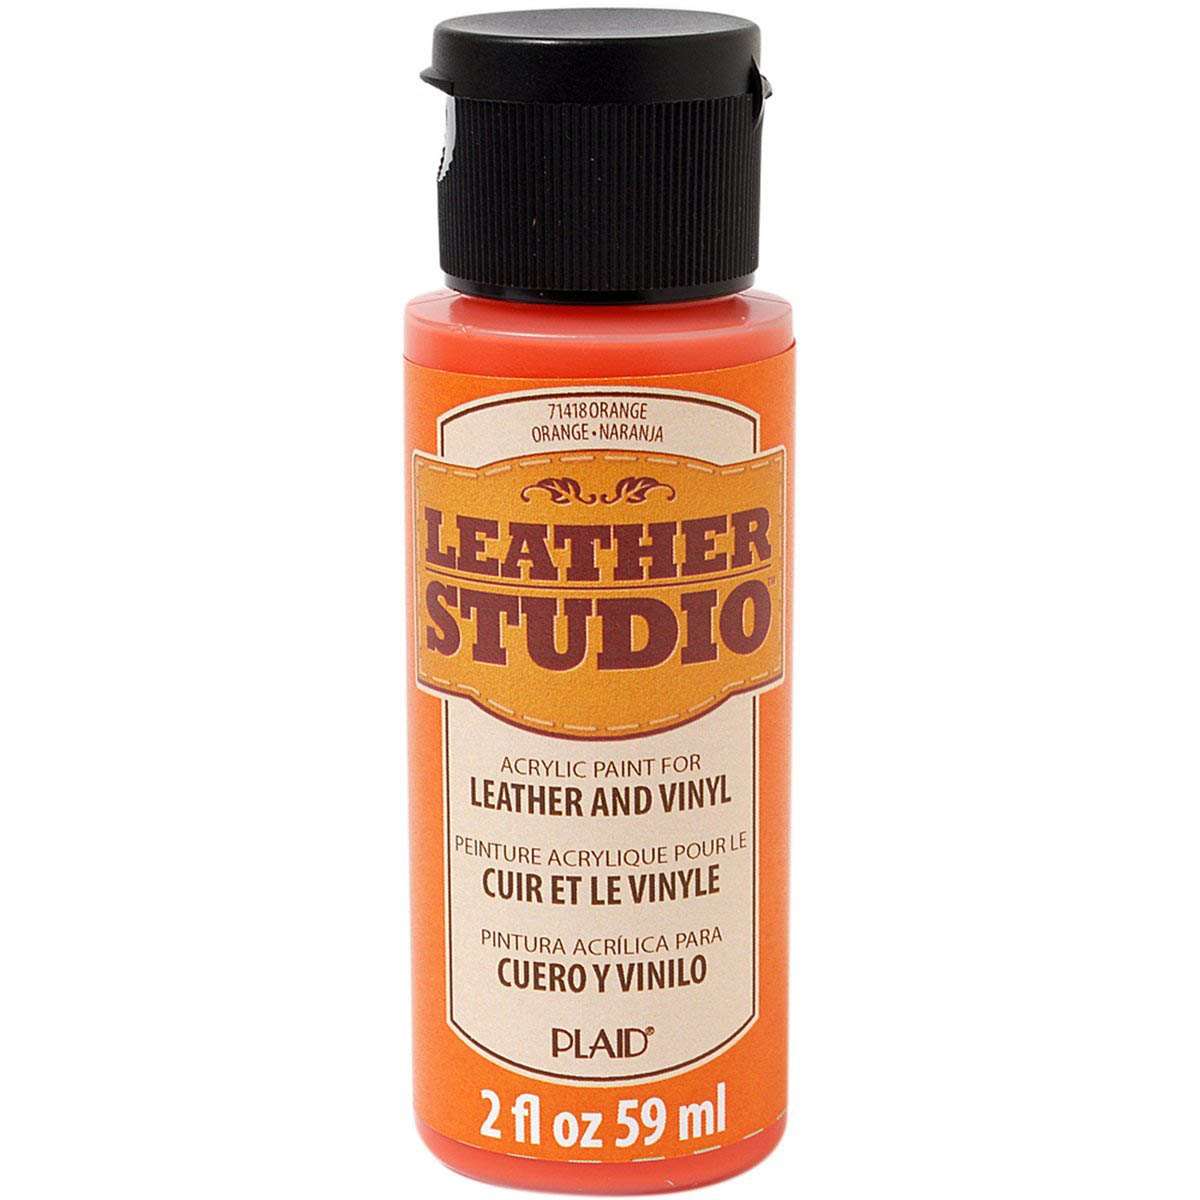 Leather Studio™ Leather & Vinyl Paint Colors - Orange, 2 oz.